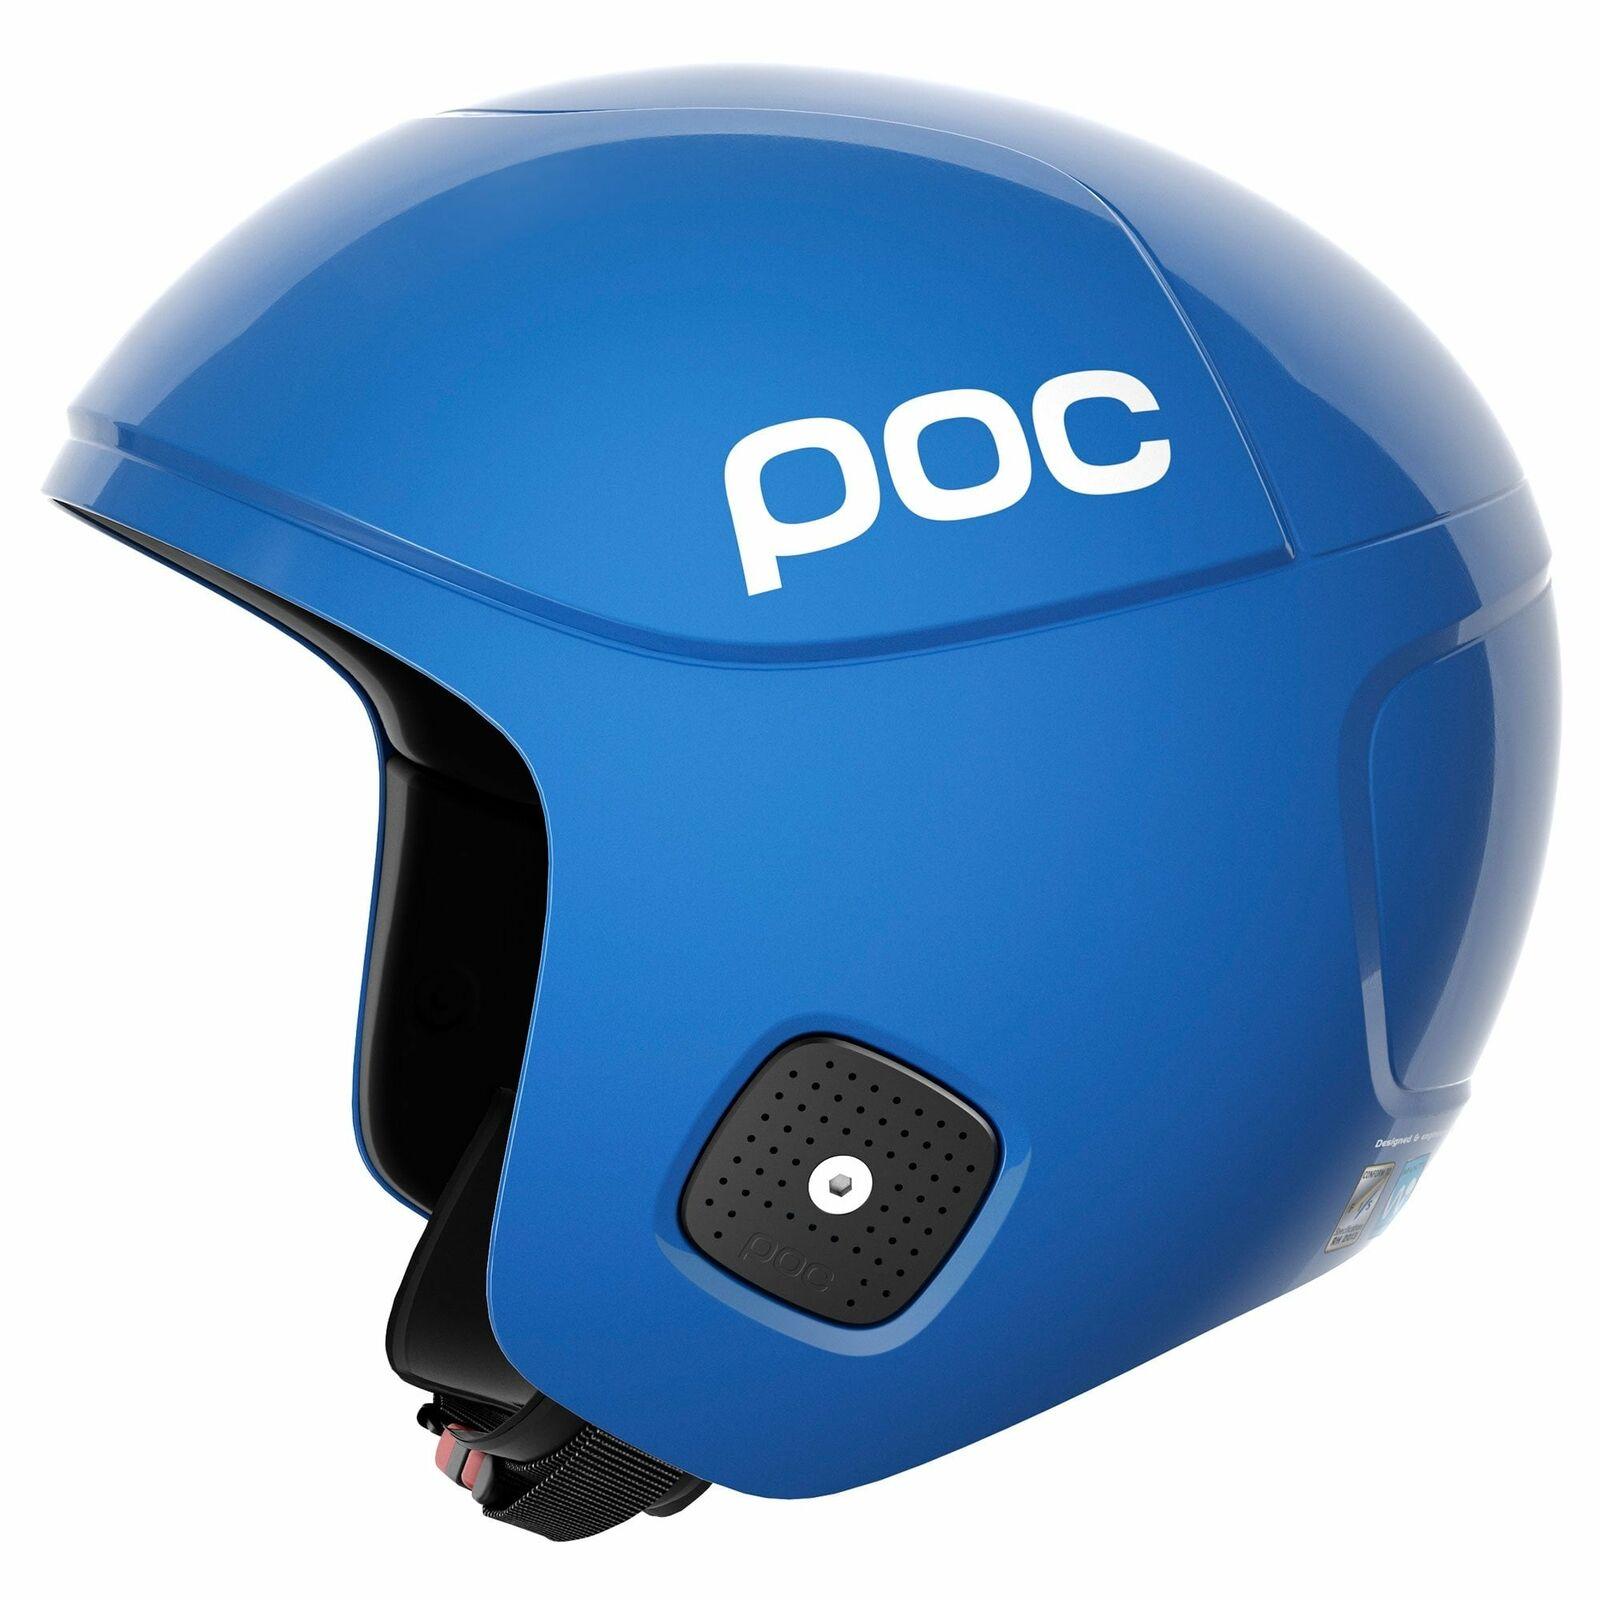 POC Orbic X Spin Race Helmet - Basketane bluee